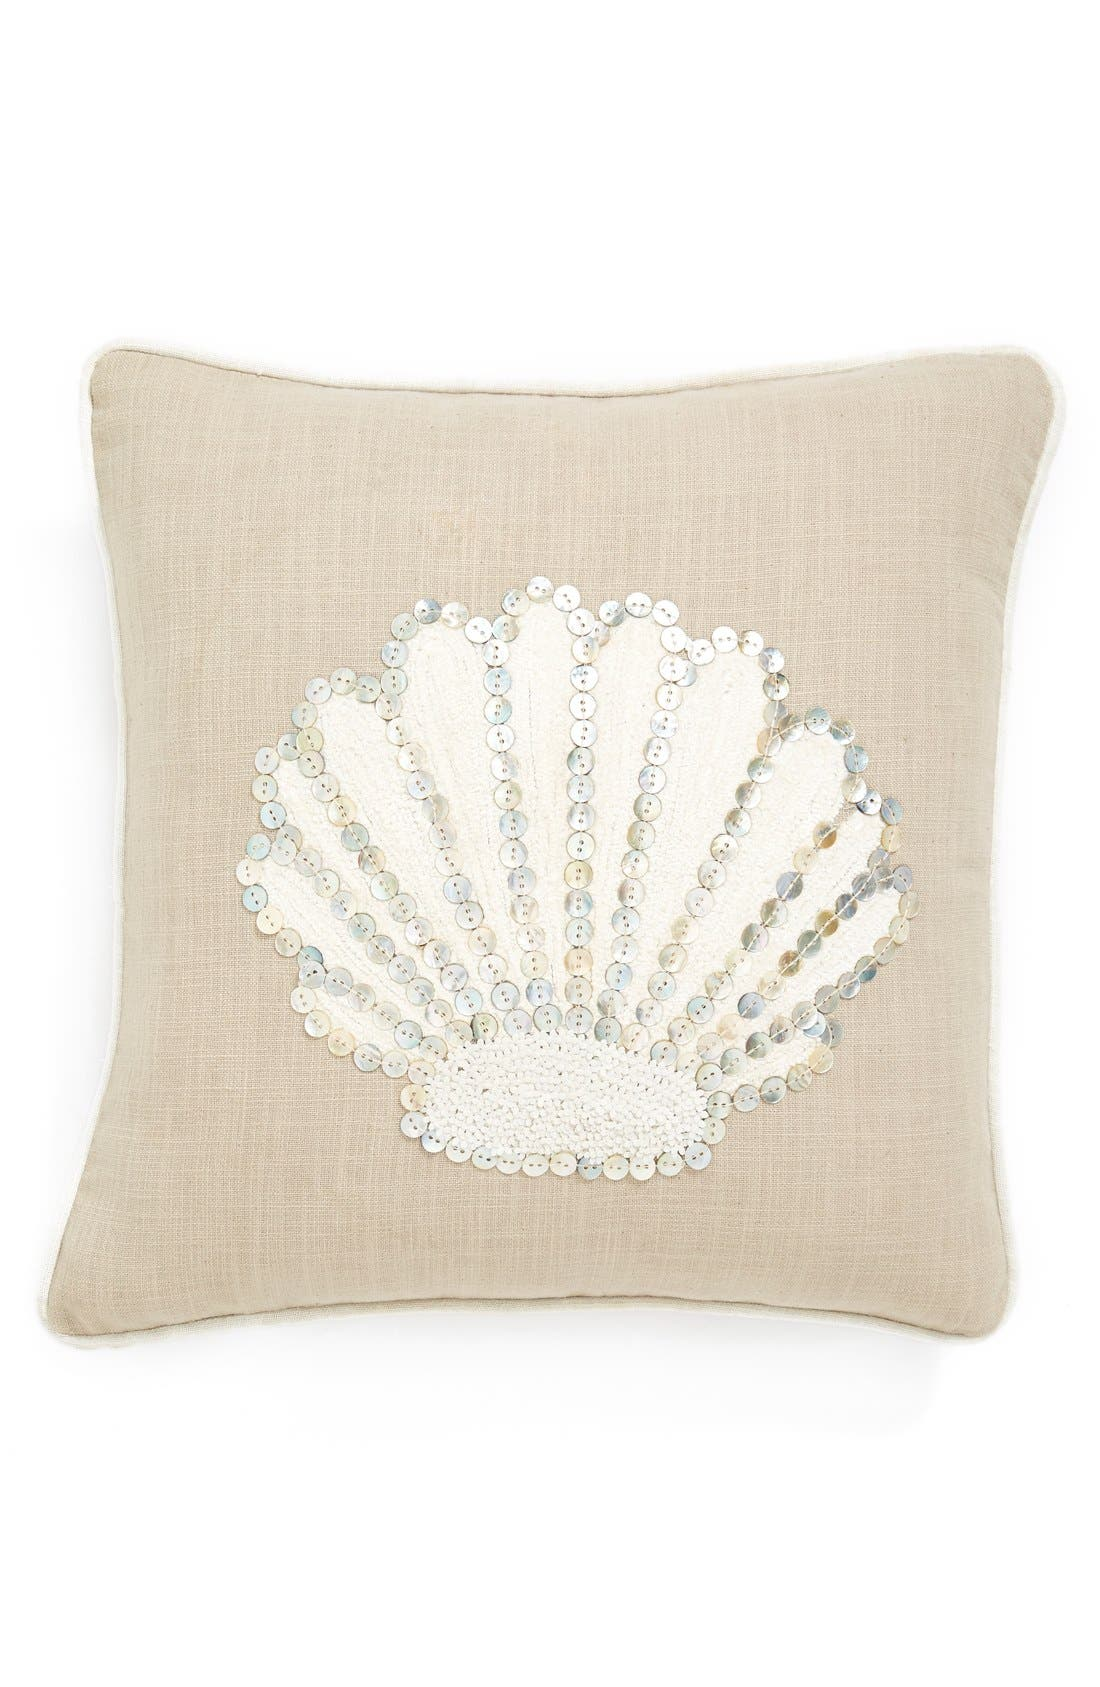 Alternate Image 1 Selected - Loloi 'Seashell' Pillow